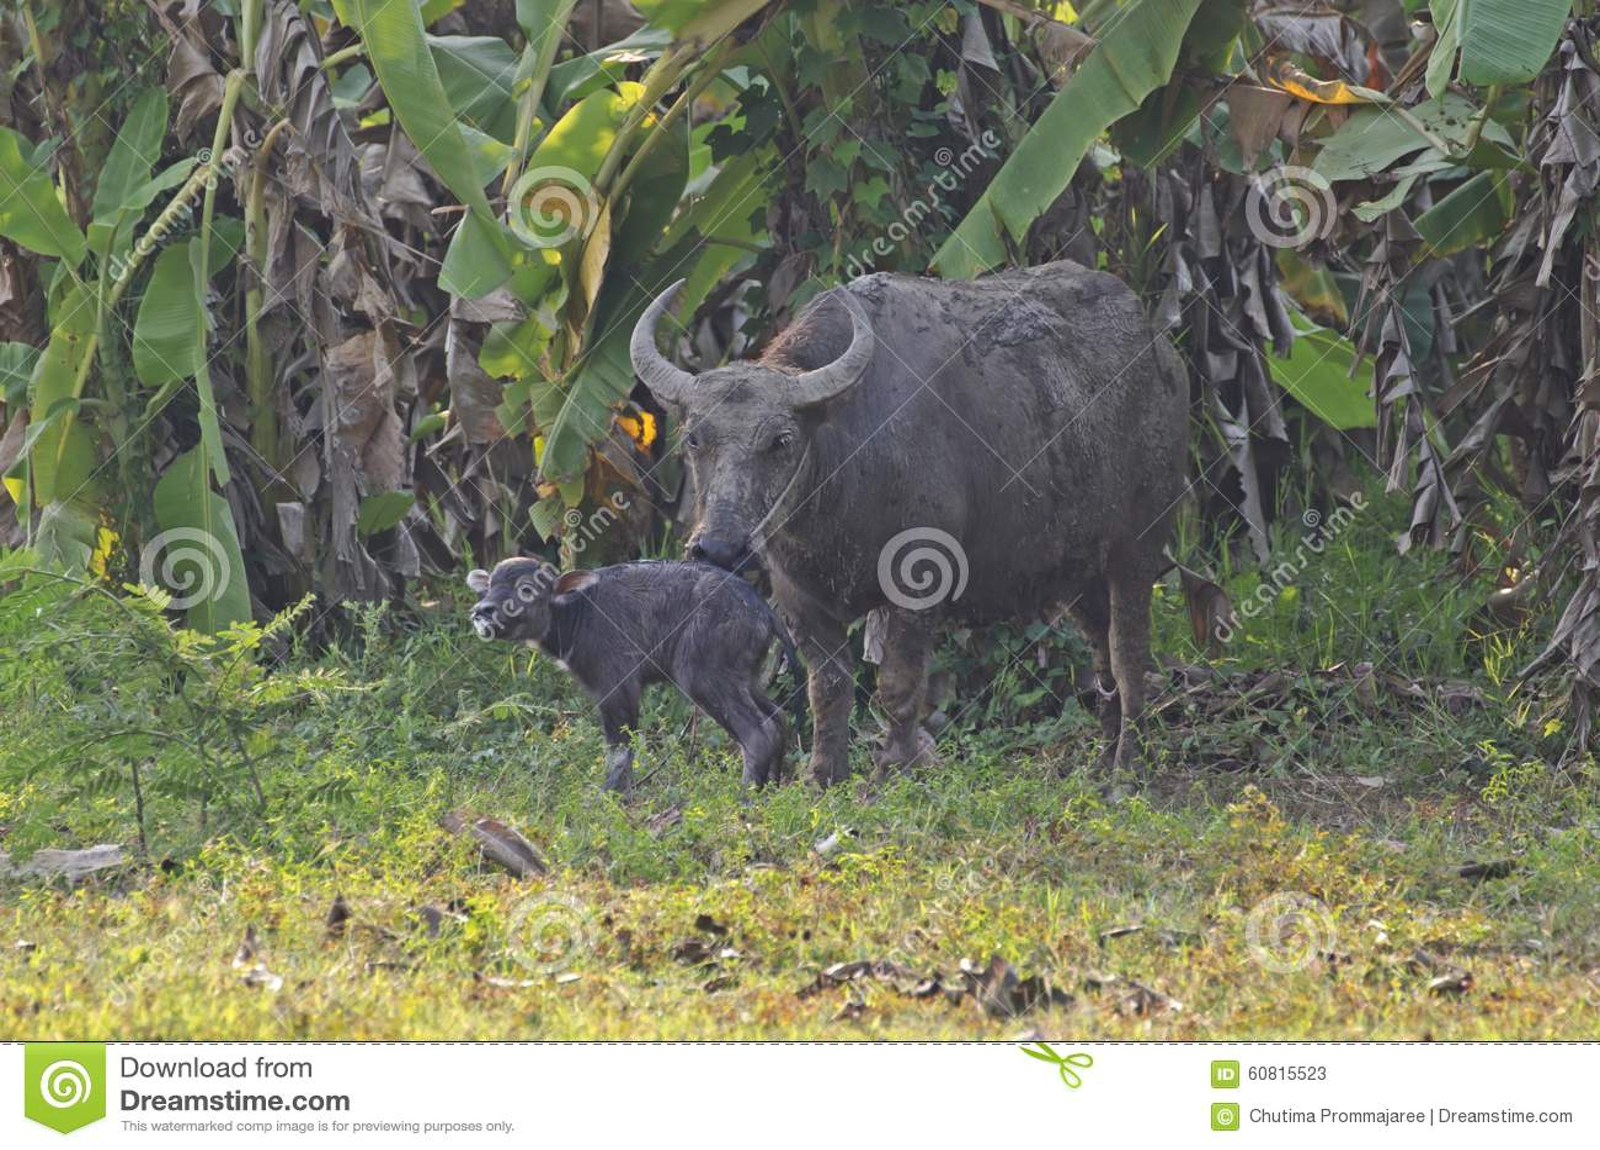 Water buffalo and baby stock image. Image of heat, baby ...